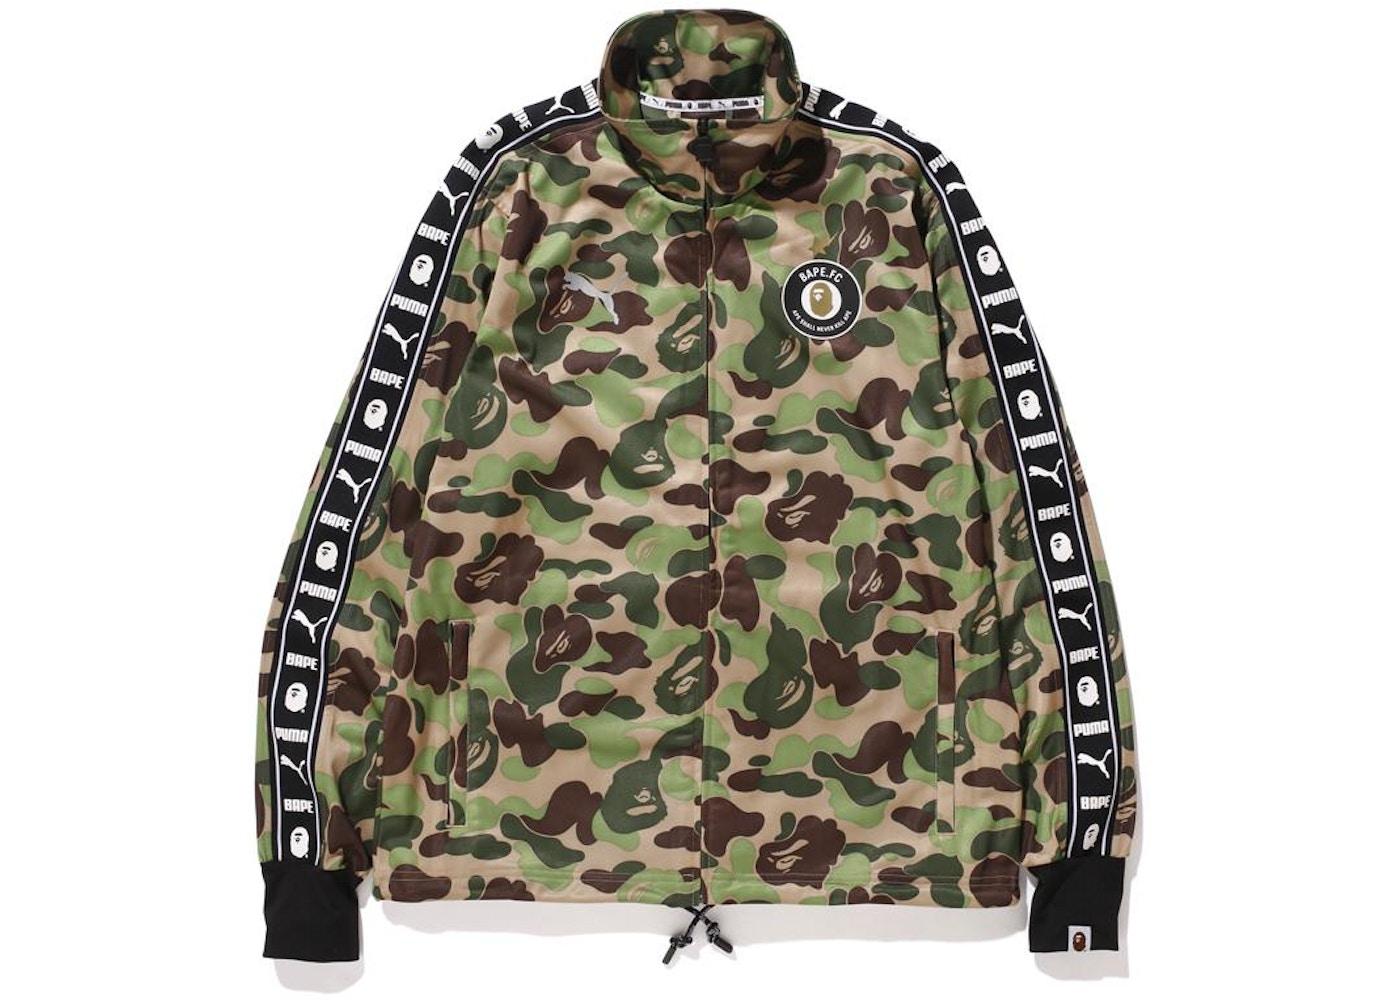 bf5145635 Streetwear - Bape Jackets - New Highest Bids